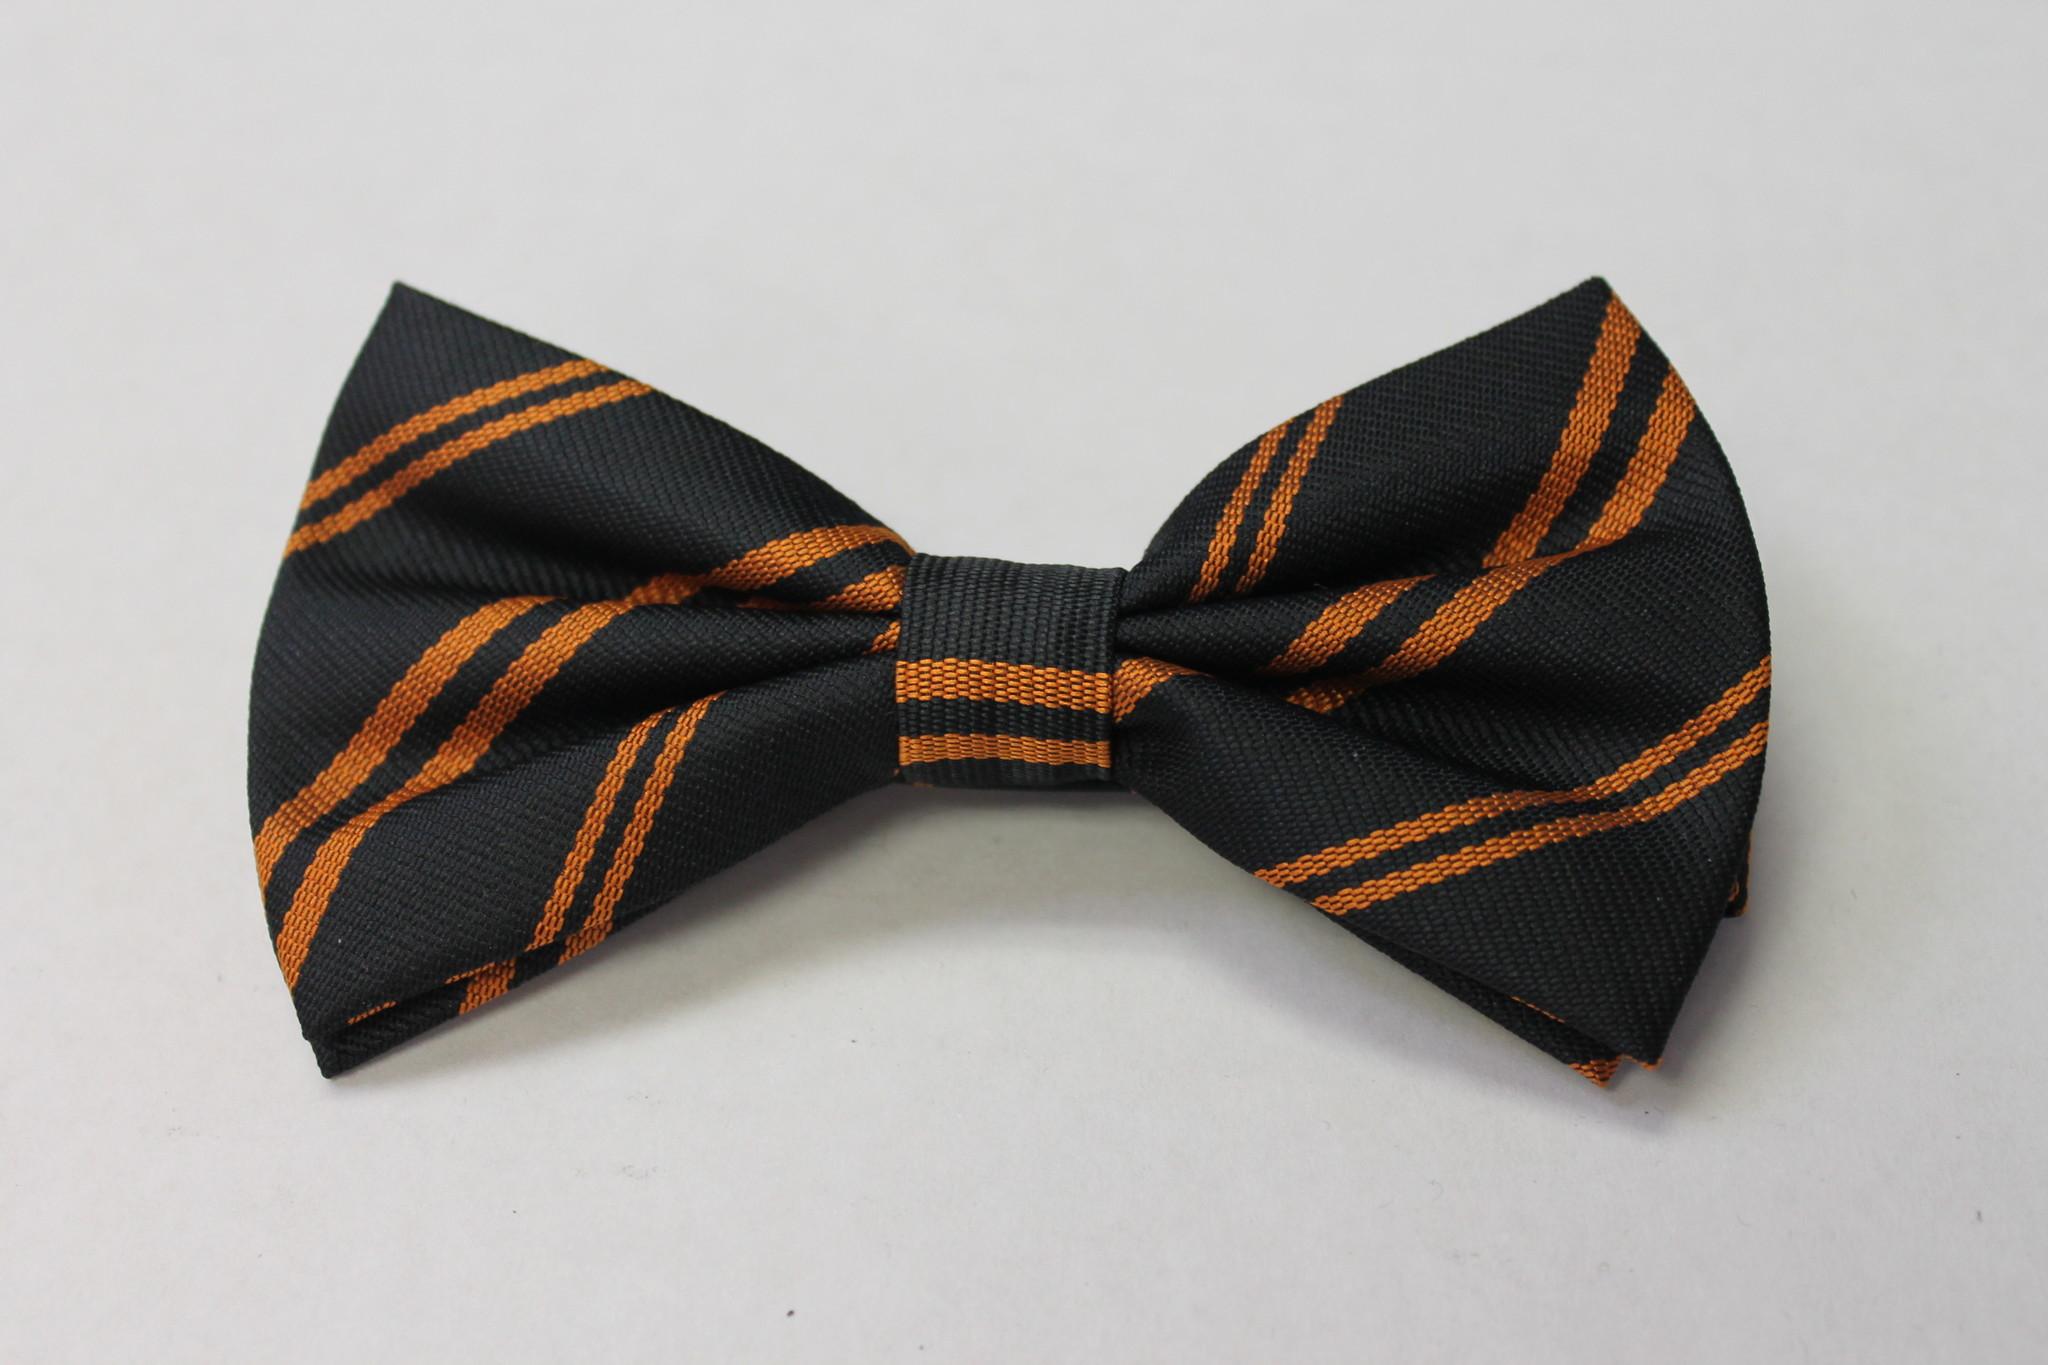 Formal Dress - Upper School Bow Tie